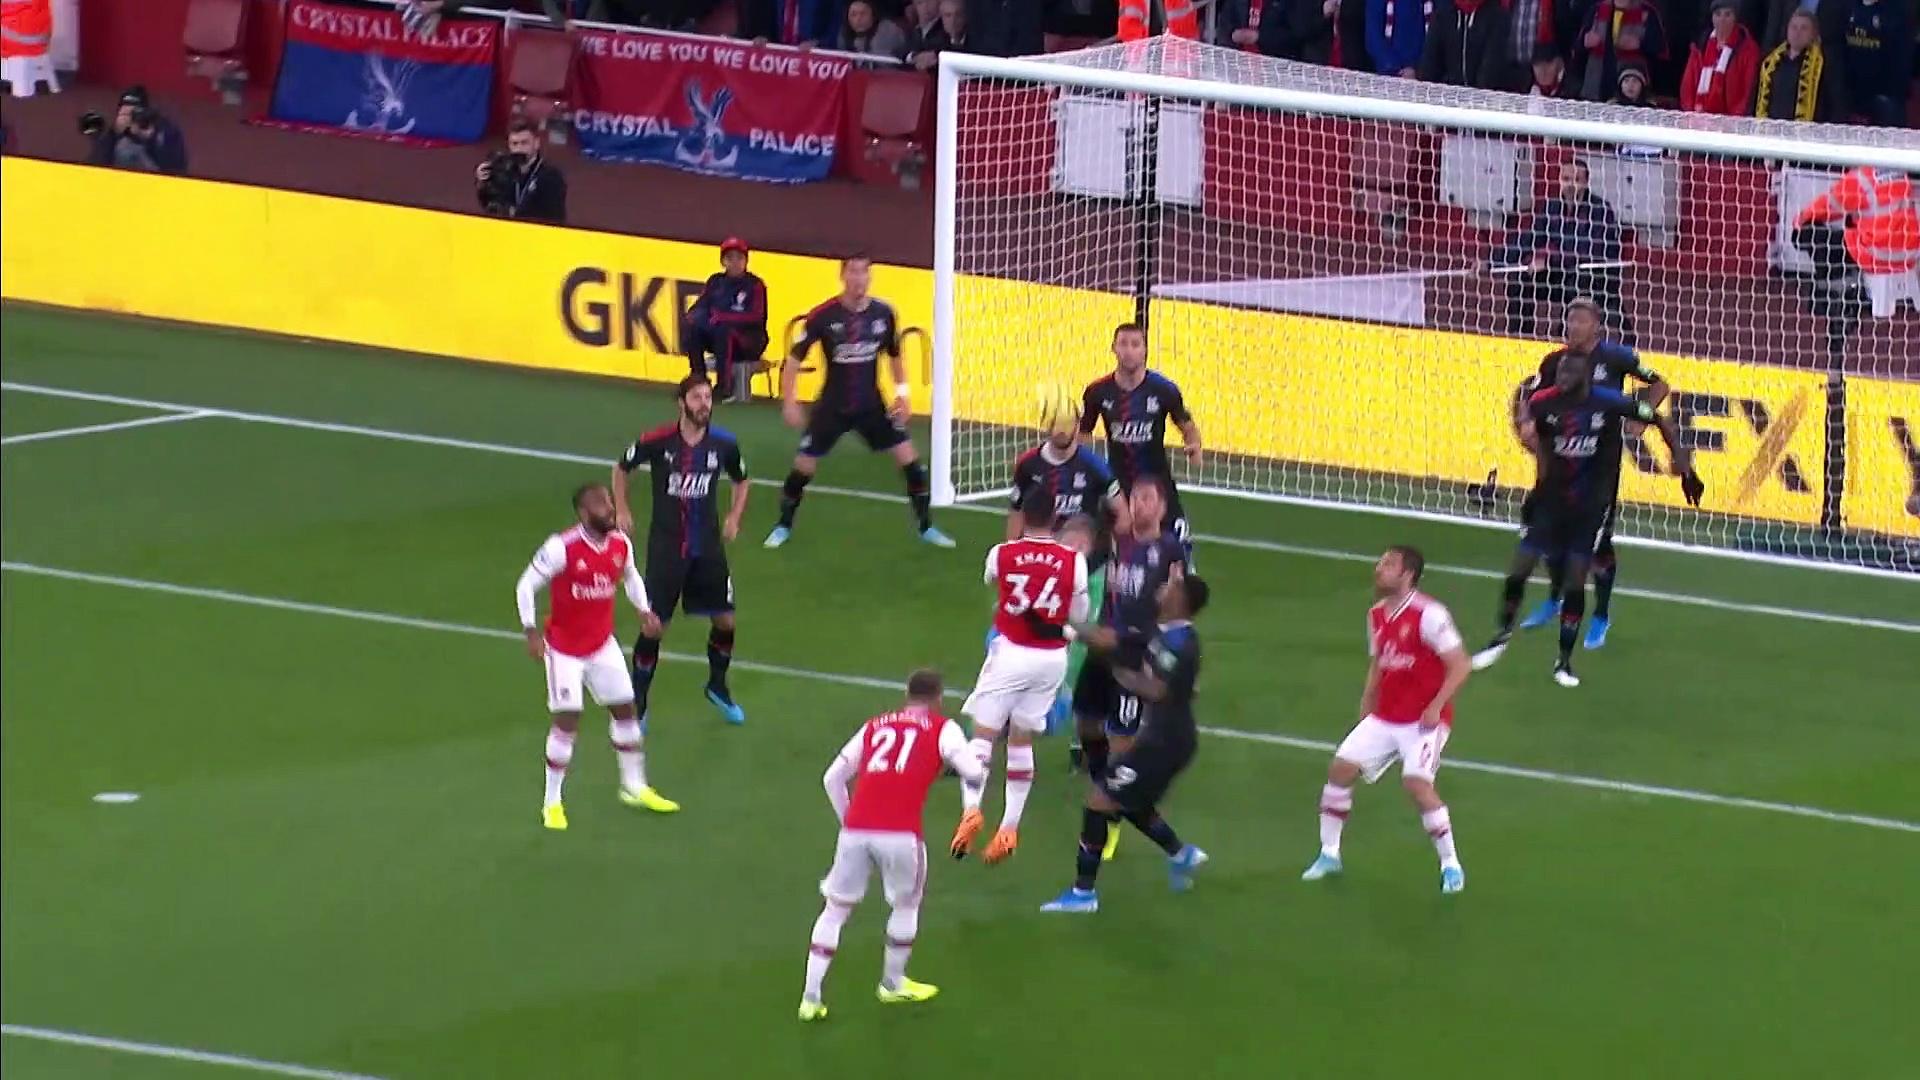 10. Hafta / Arsenal - Crystal Palace: 2-2 (Özet)